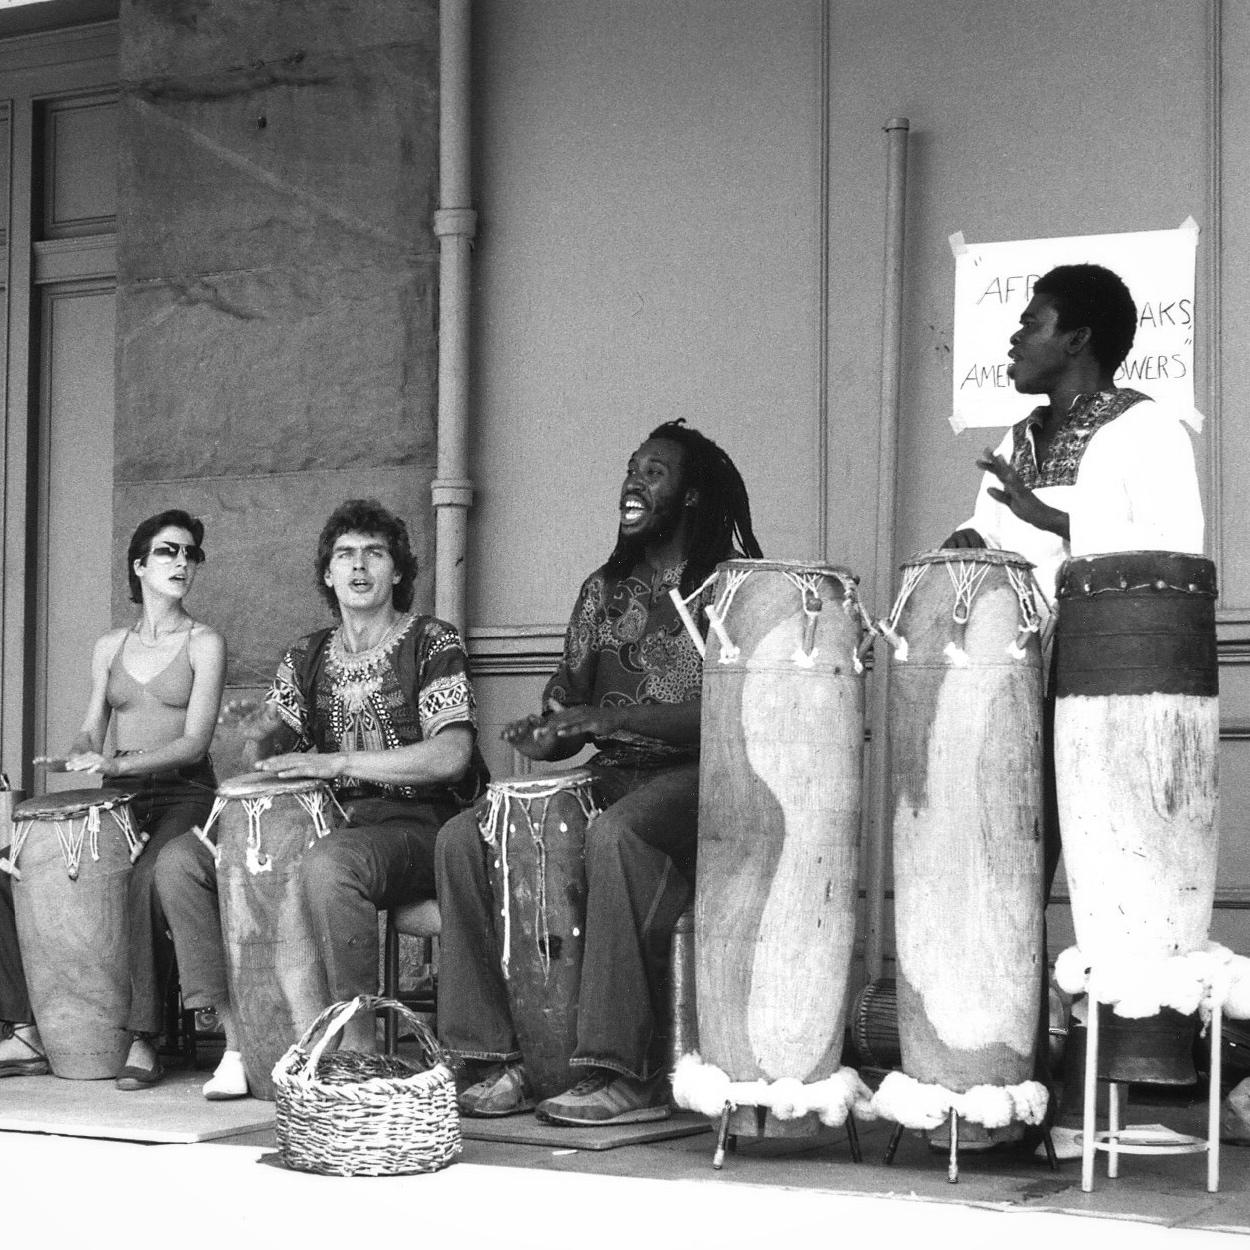 Valerie, Brian Davis, Caton Lyles, and master drummer Obo Addy